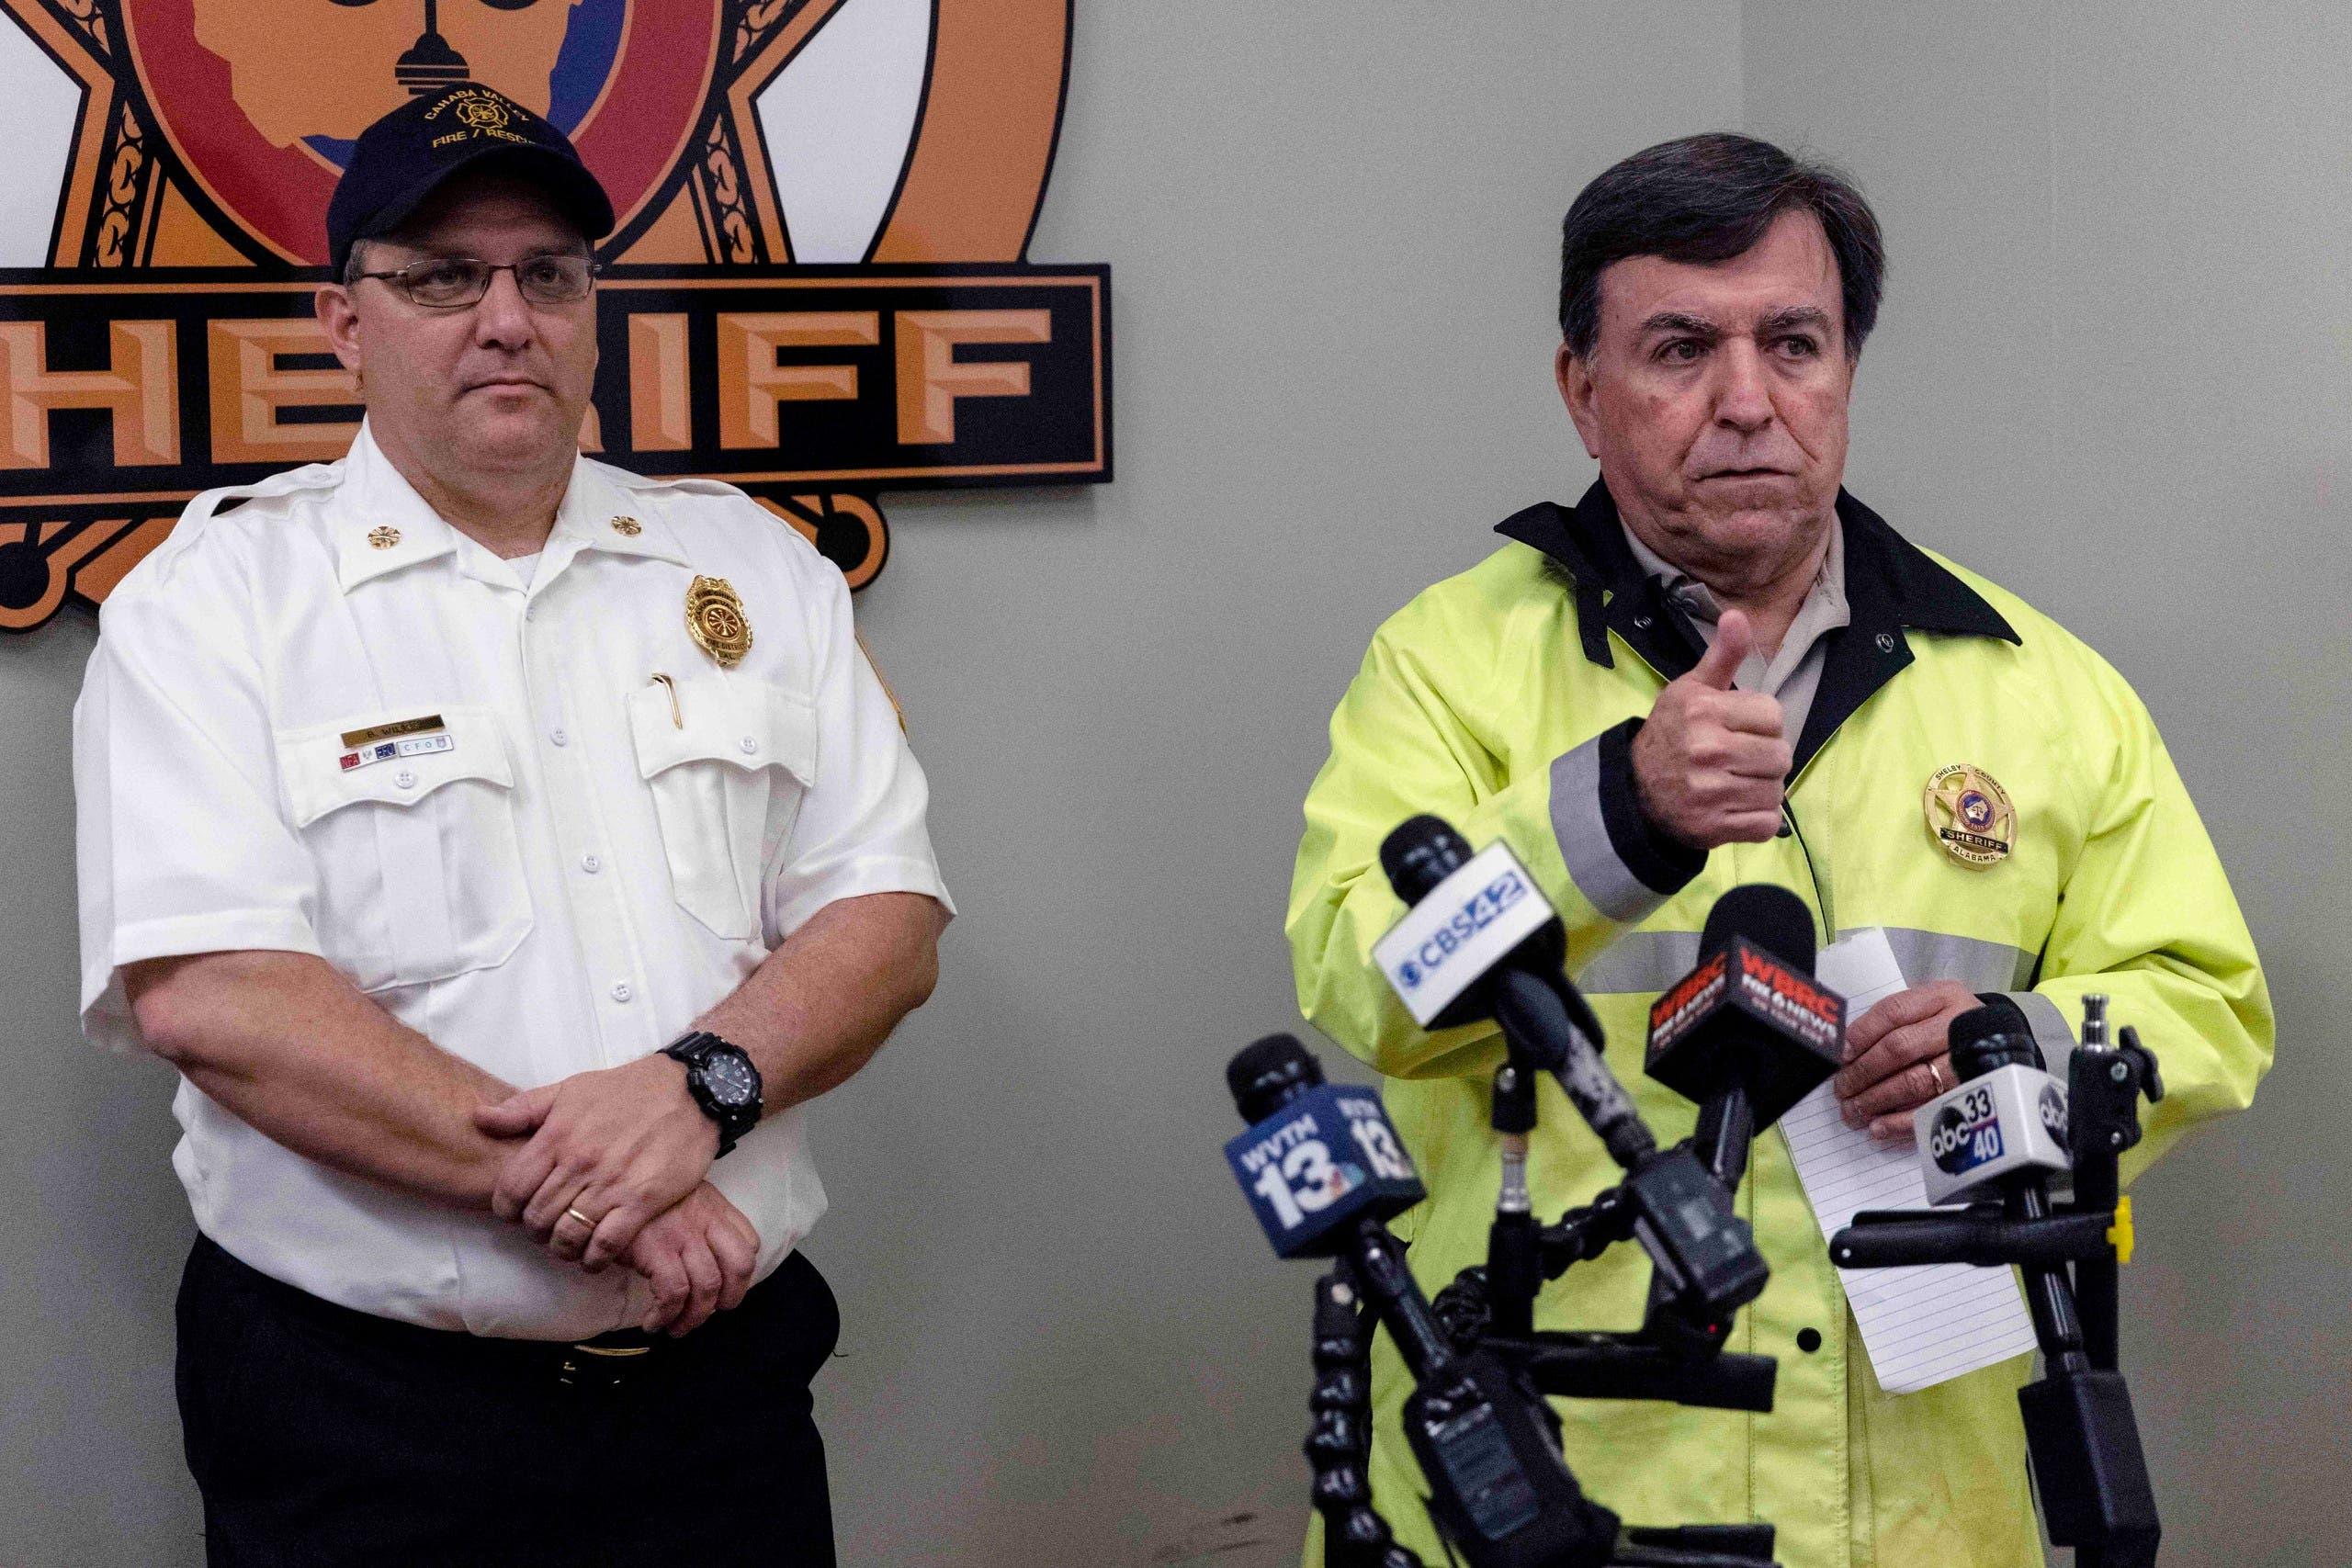 Shelby County Sheriff John Samaniego speaks at a press conference describing the tornado damage to Shelby County, near Birmingham, Ala., Thursday, March 25, 2021. (AP)